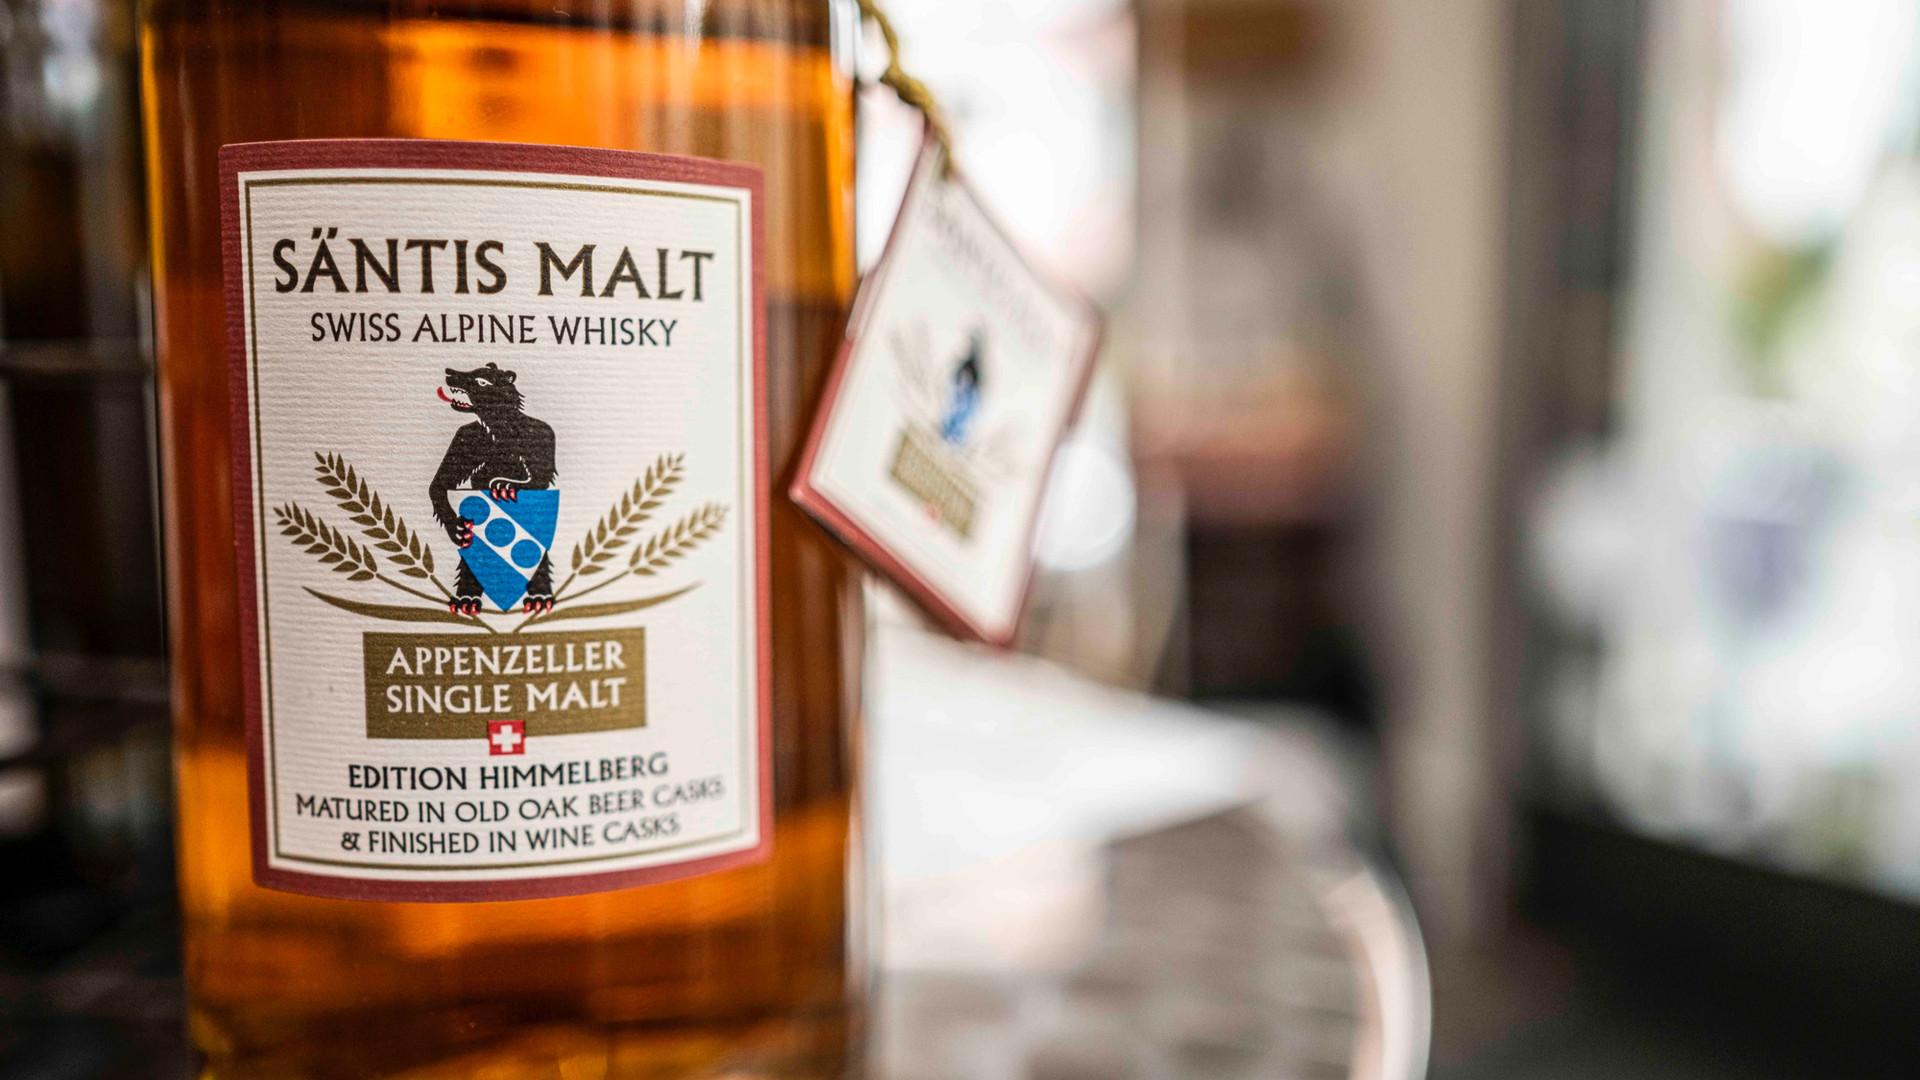 saentis malt swiss alpine whisky